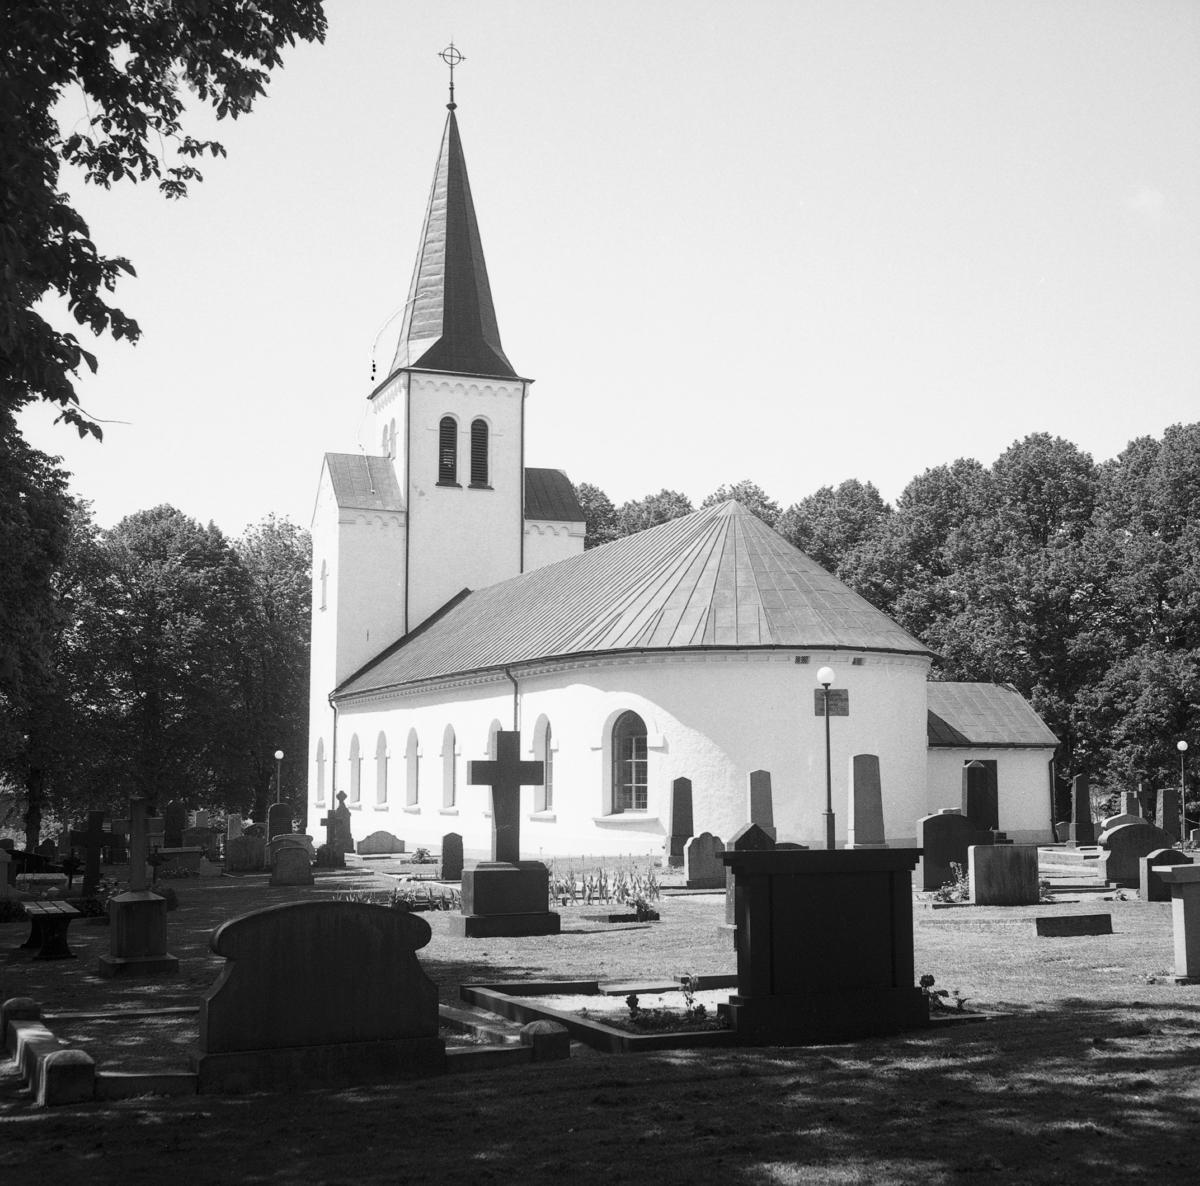 A. Rvinge Kyrkogrd - omr-scanner.net